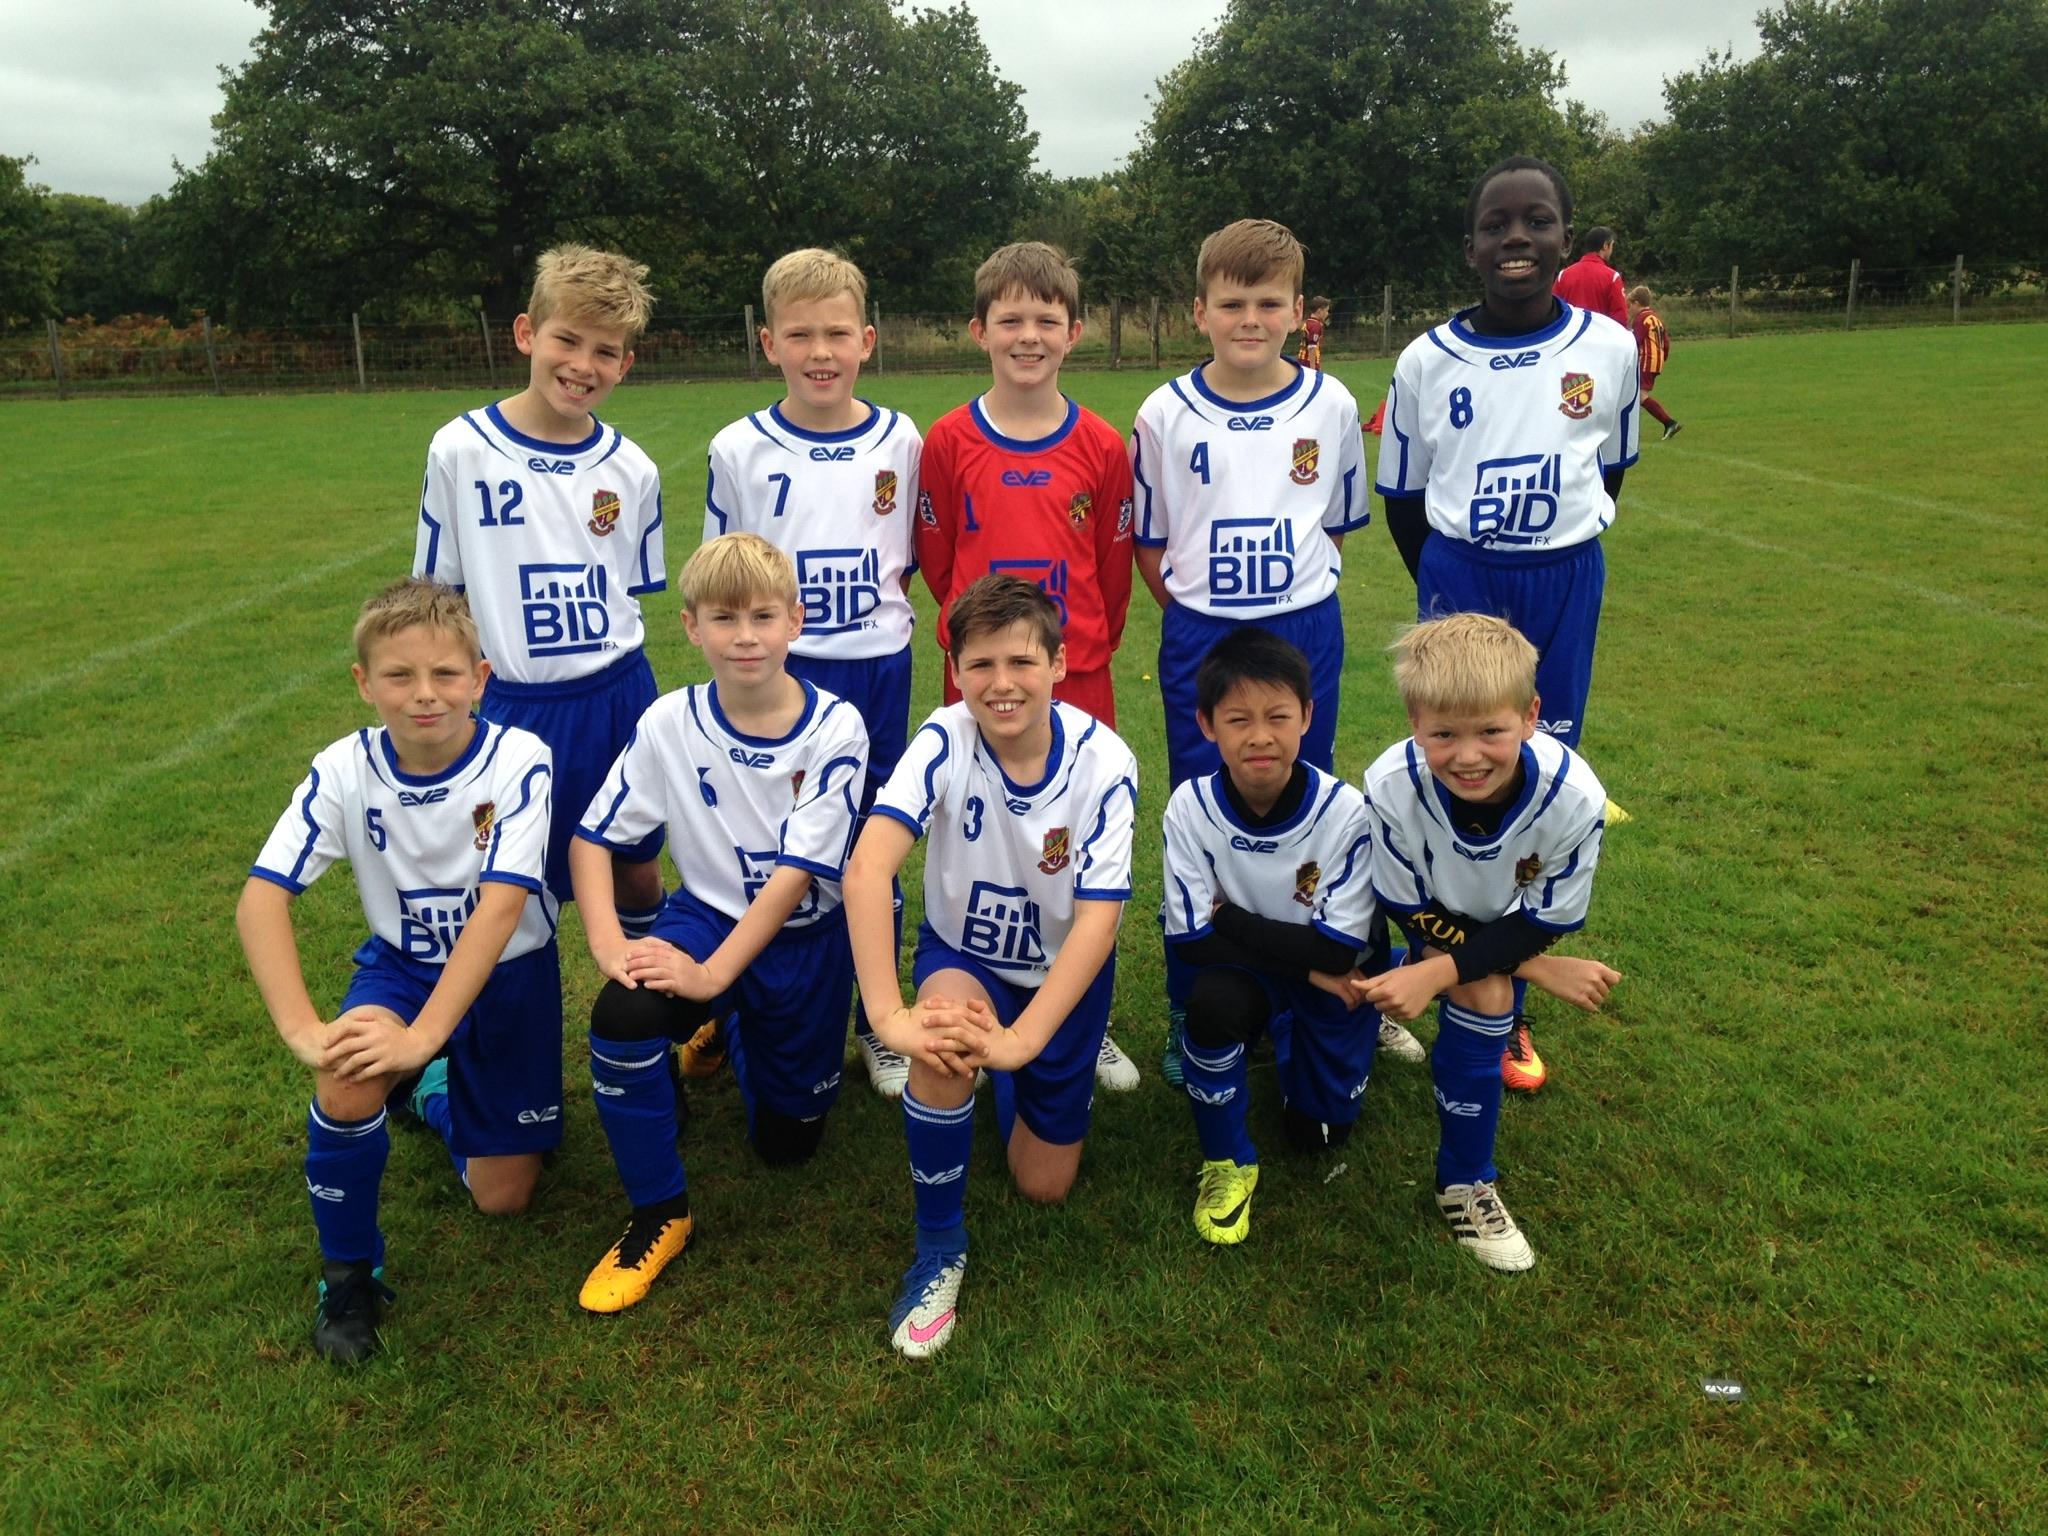 BidFX Football Team.jpg